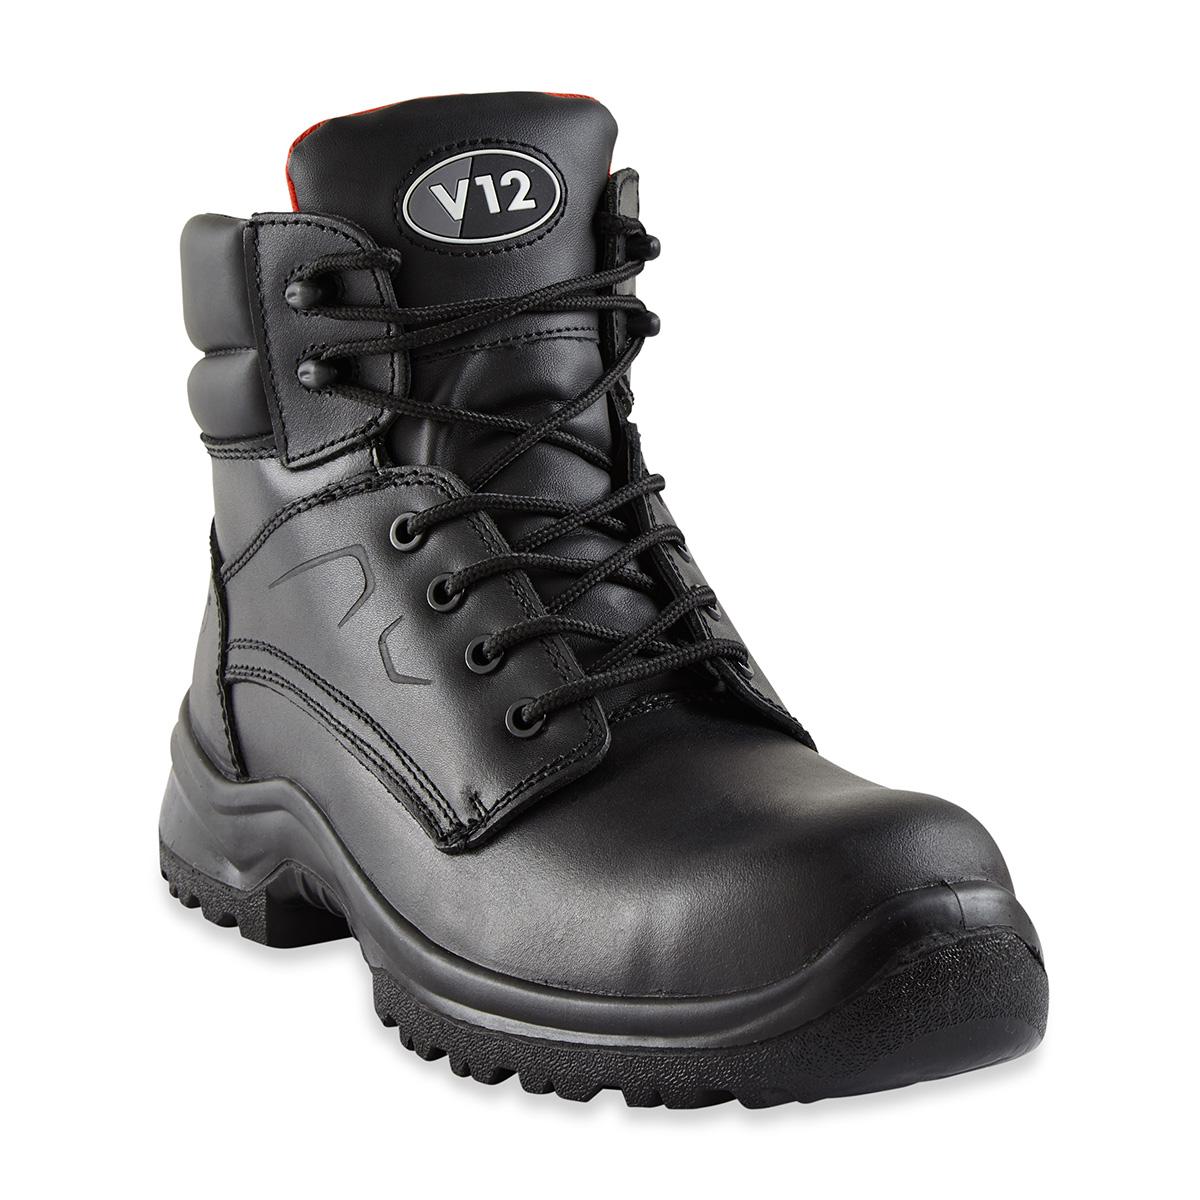 V12 Otter Safety Derby Boot